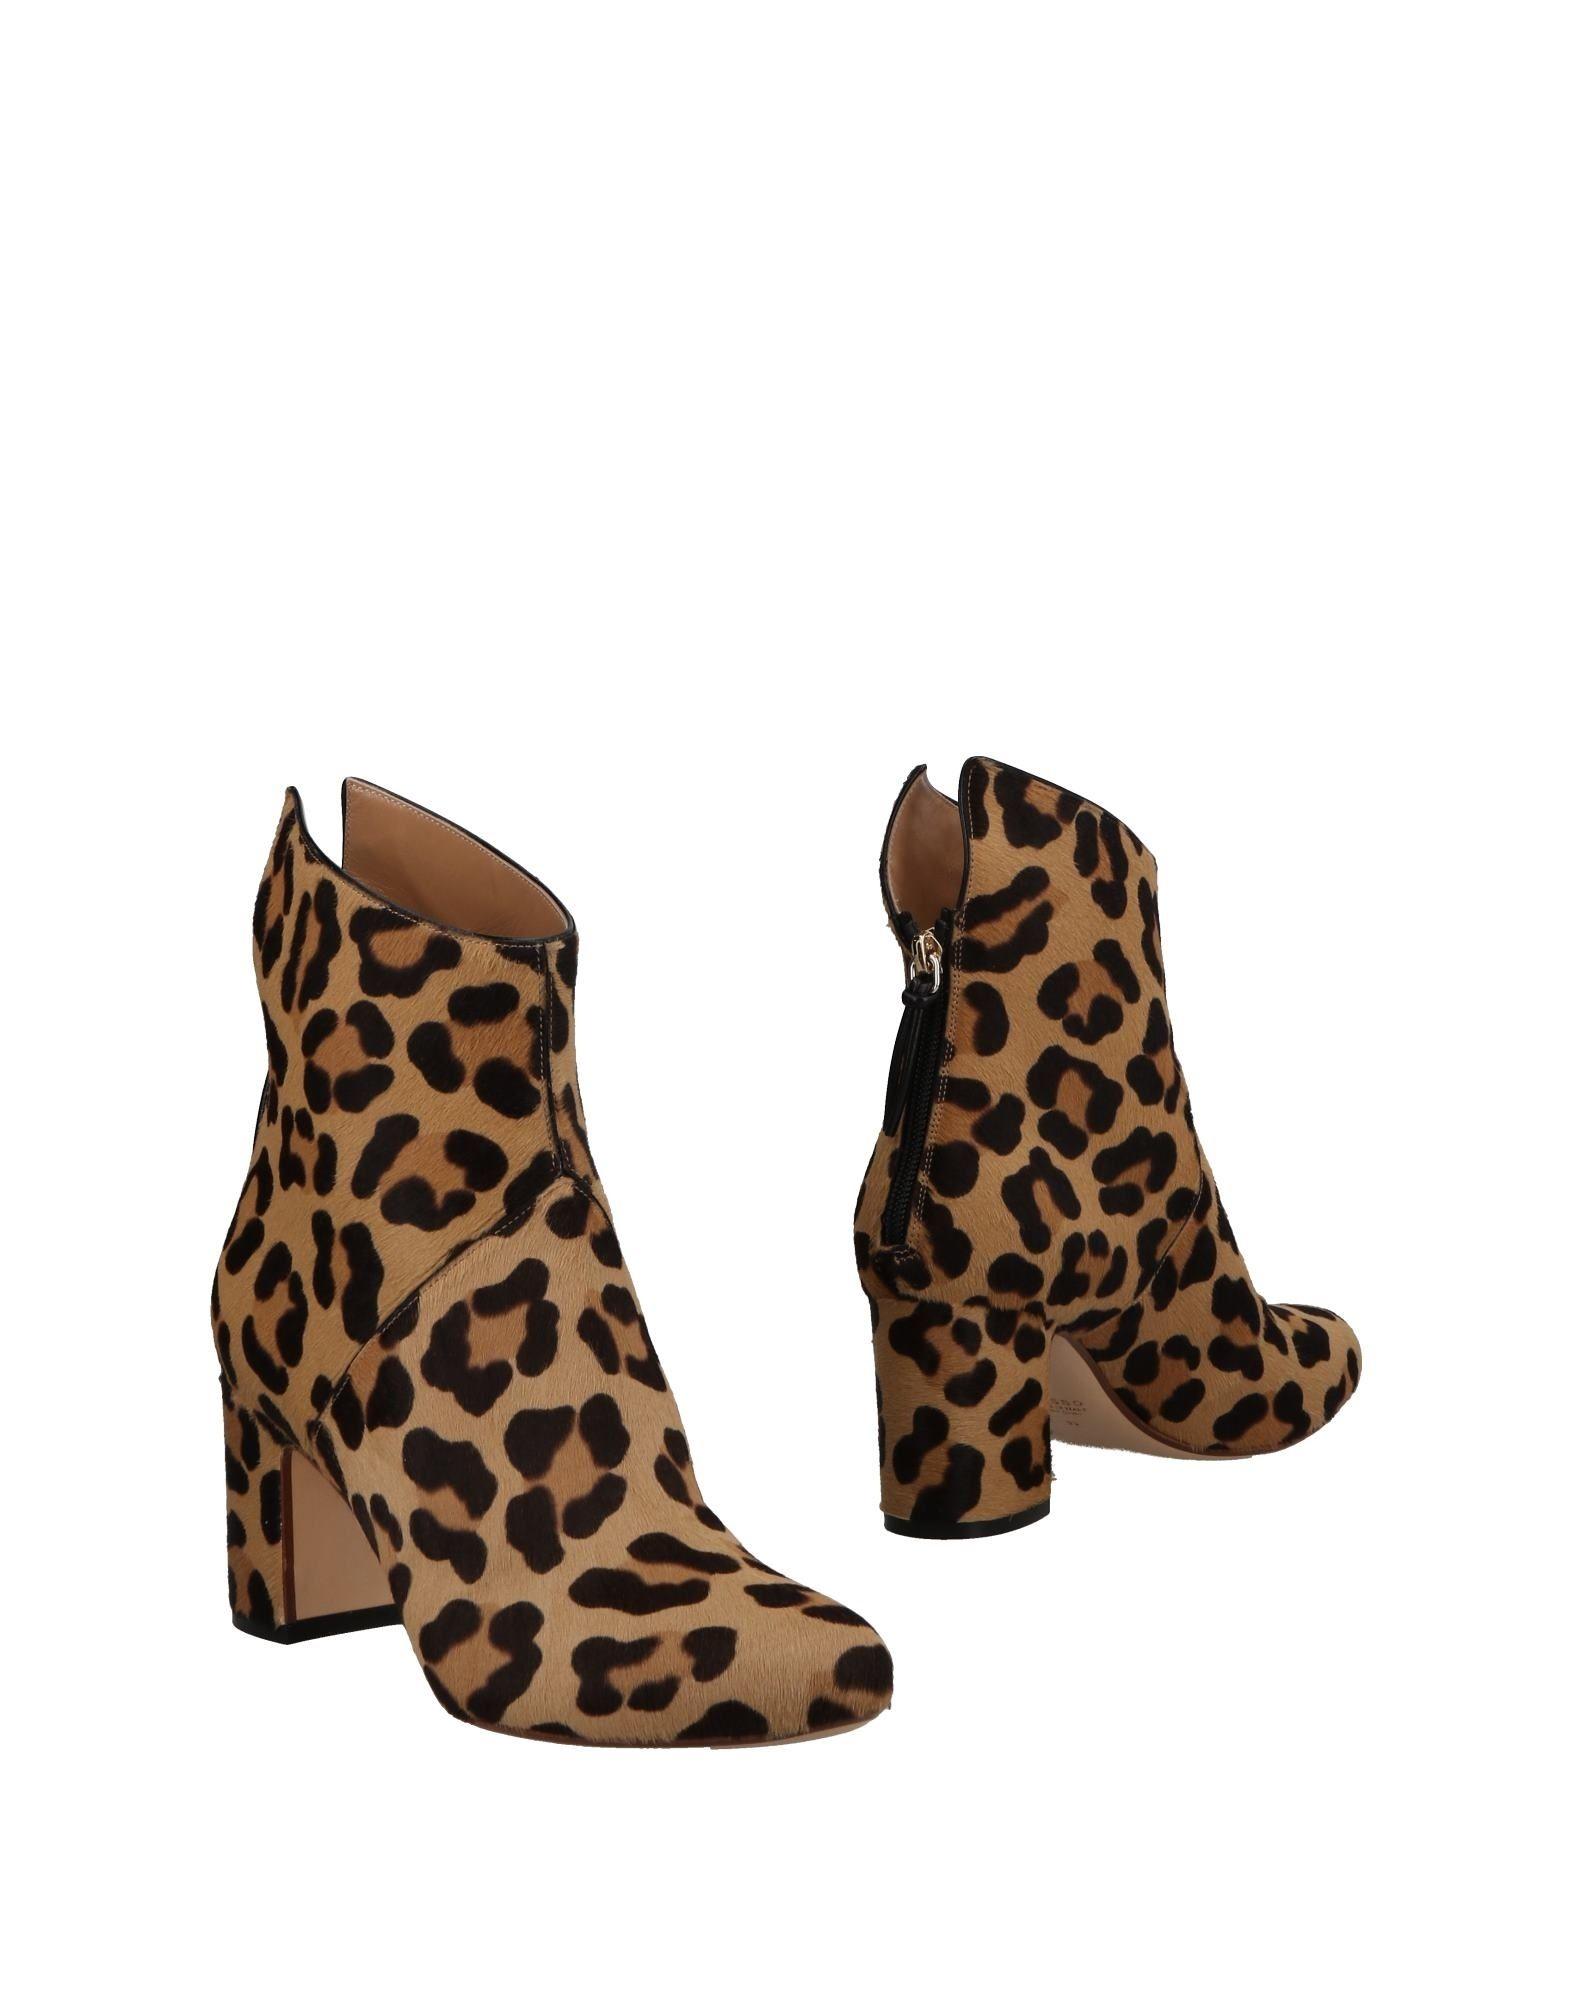 Francesco Russo Stiefelette Damen Schuhe  11481401KO Beliebte Schuhe Damen fdddde